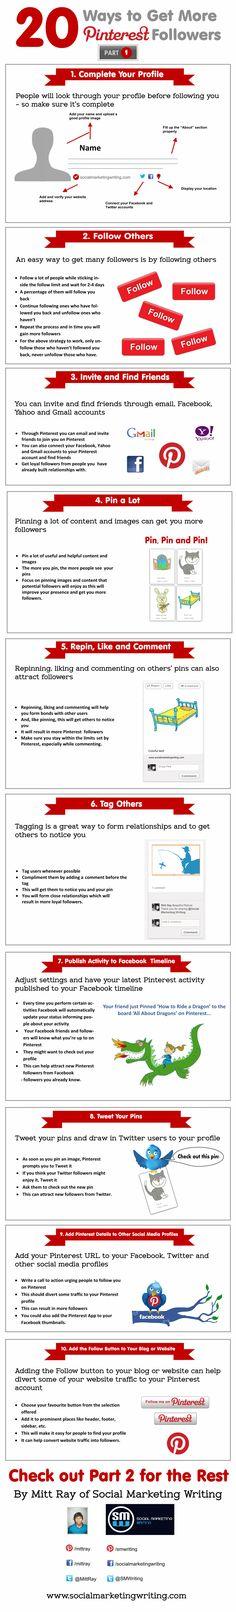 #Pinteresting > 20 Ways to Get More #Pinterest Followers